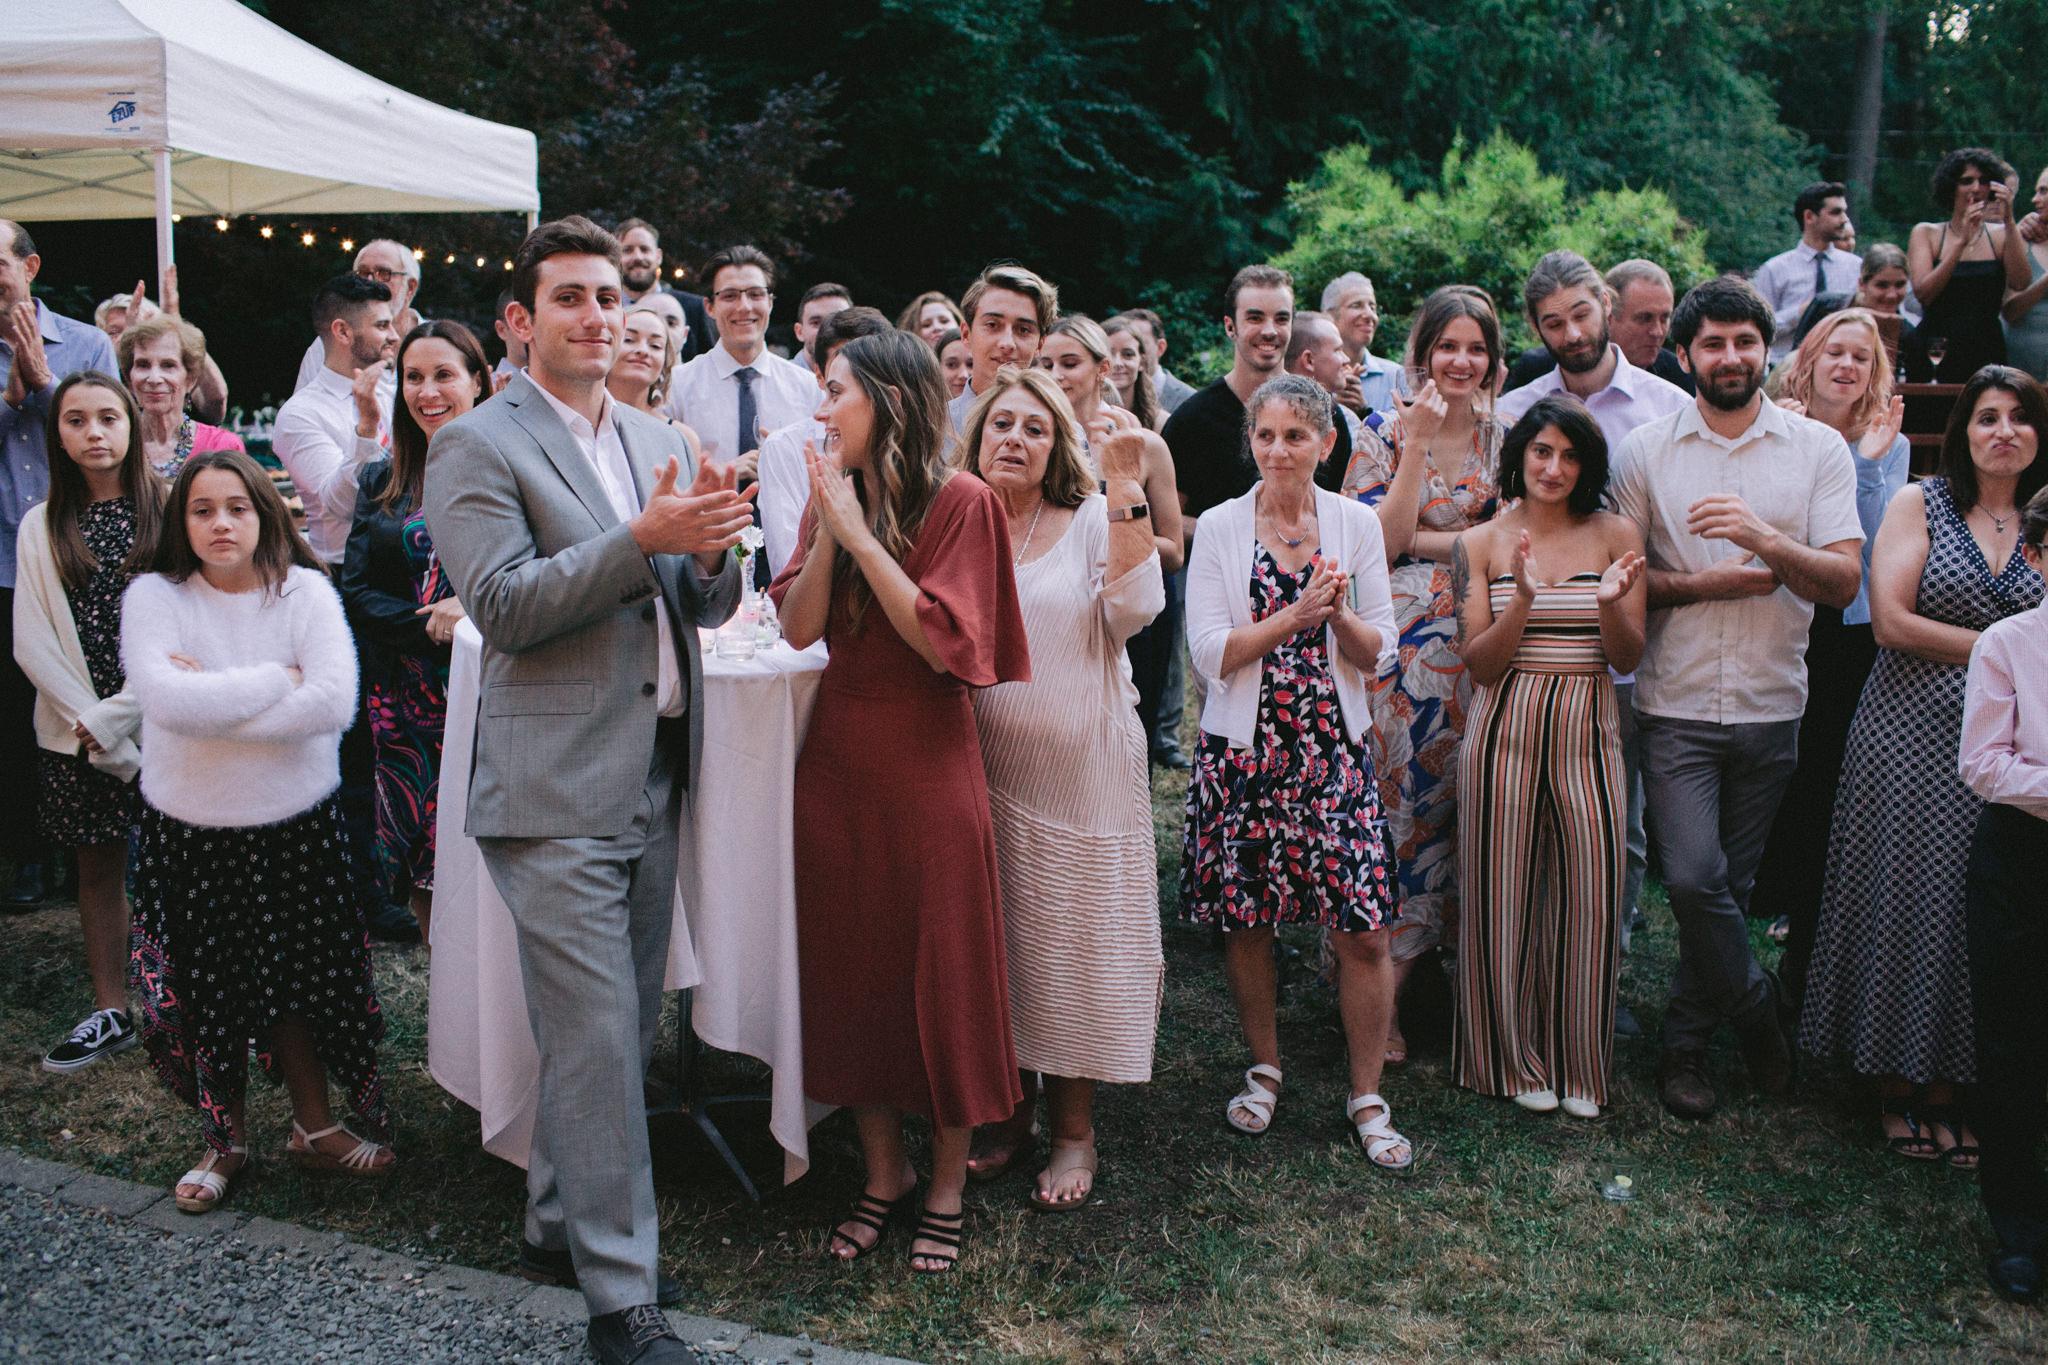 Backyard-Bainbridge-Island-Wedding-Alycia-Lovell-Photography-217.JPG